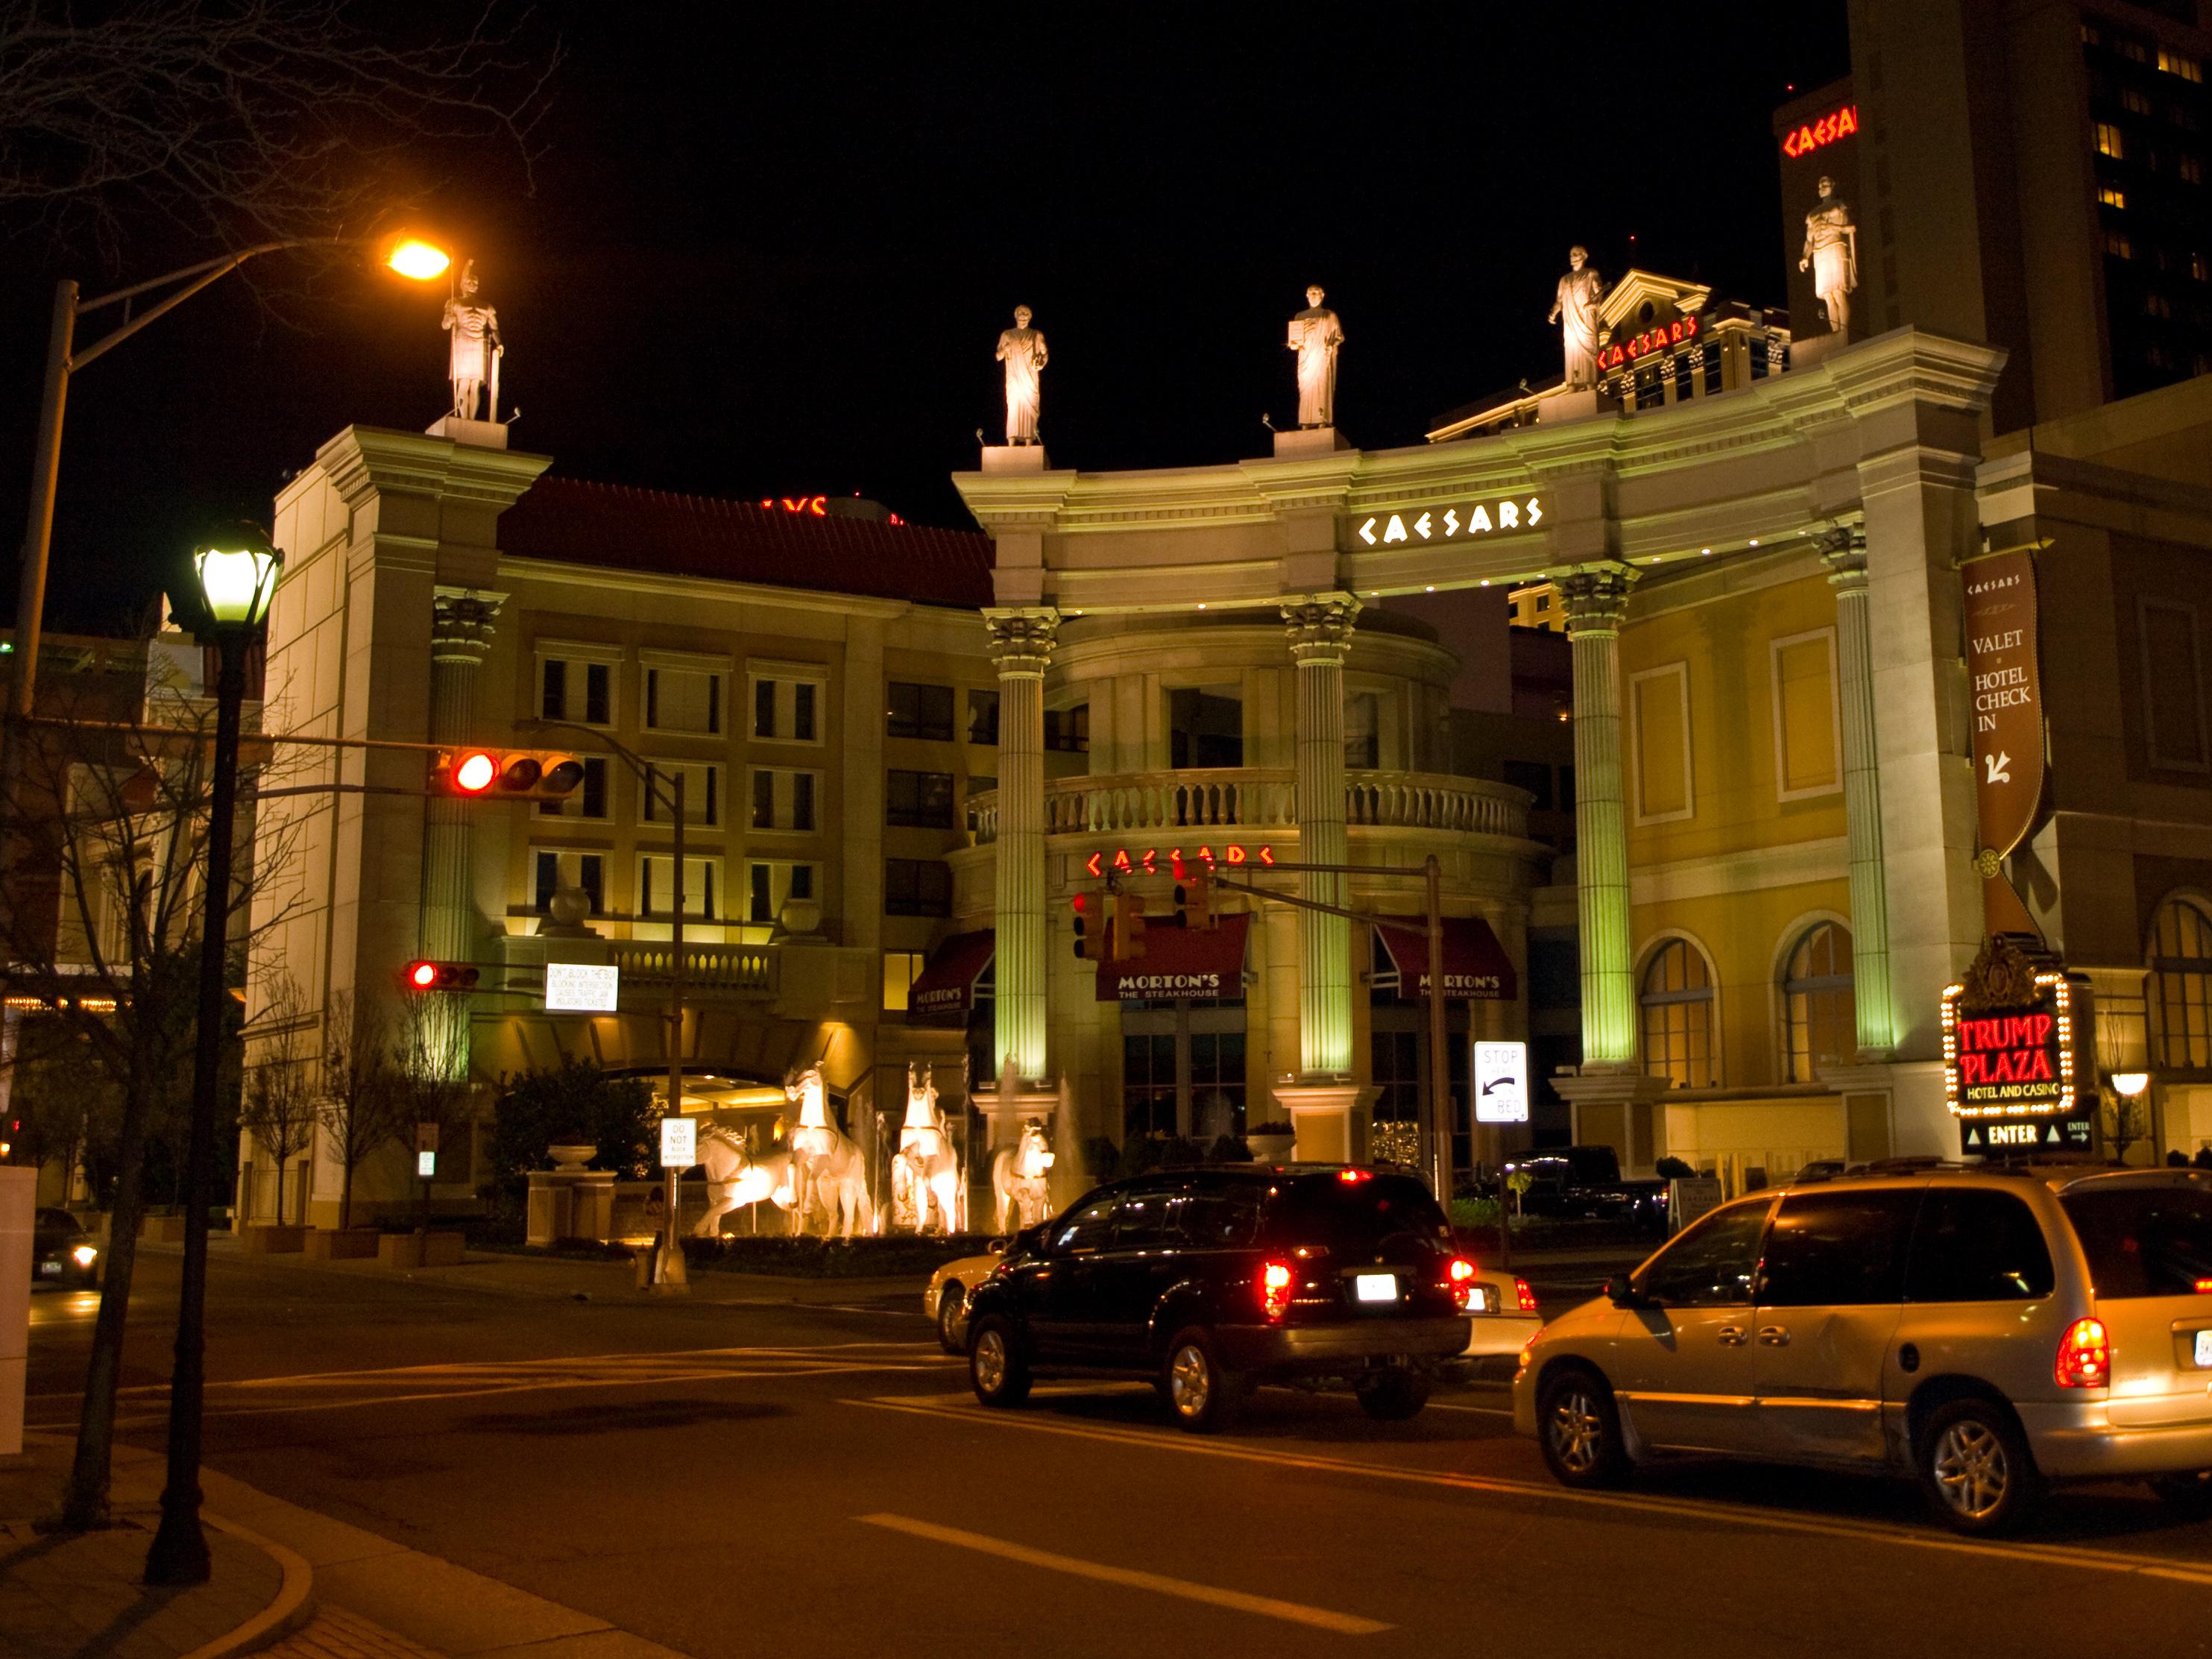 Casinos in atlantic city new jersey harris casino in north carolina